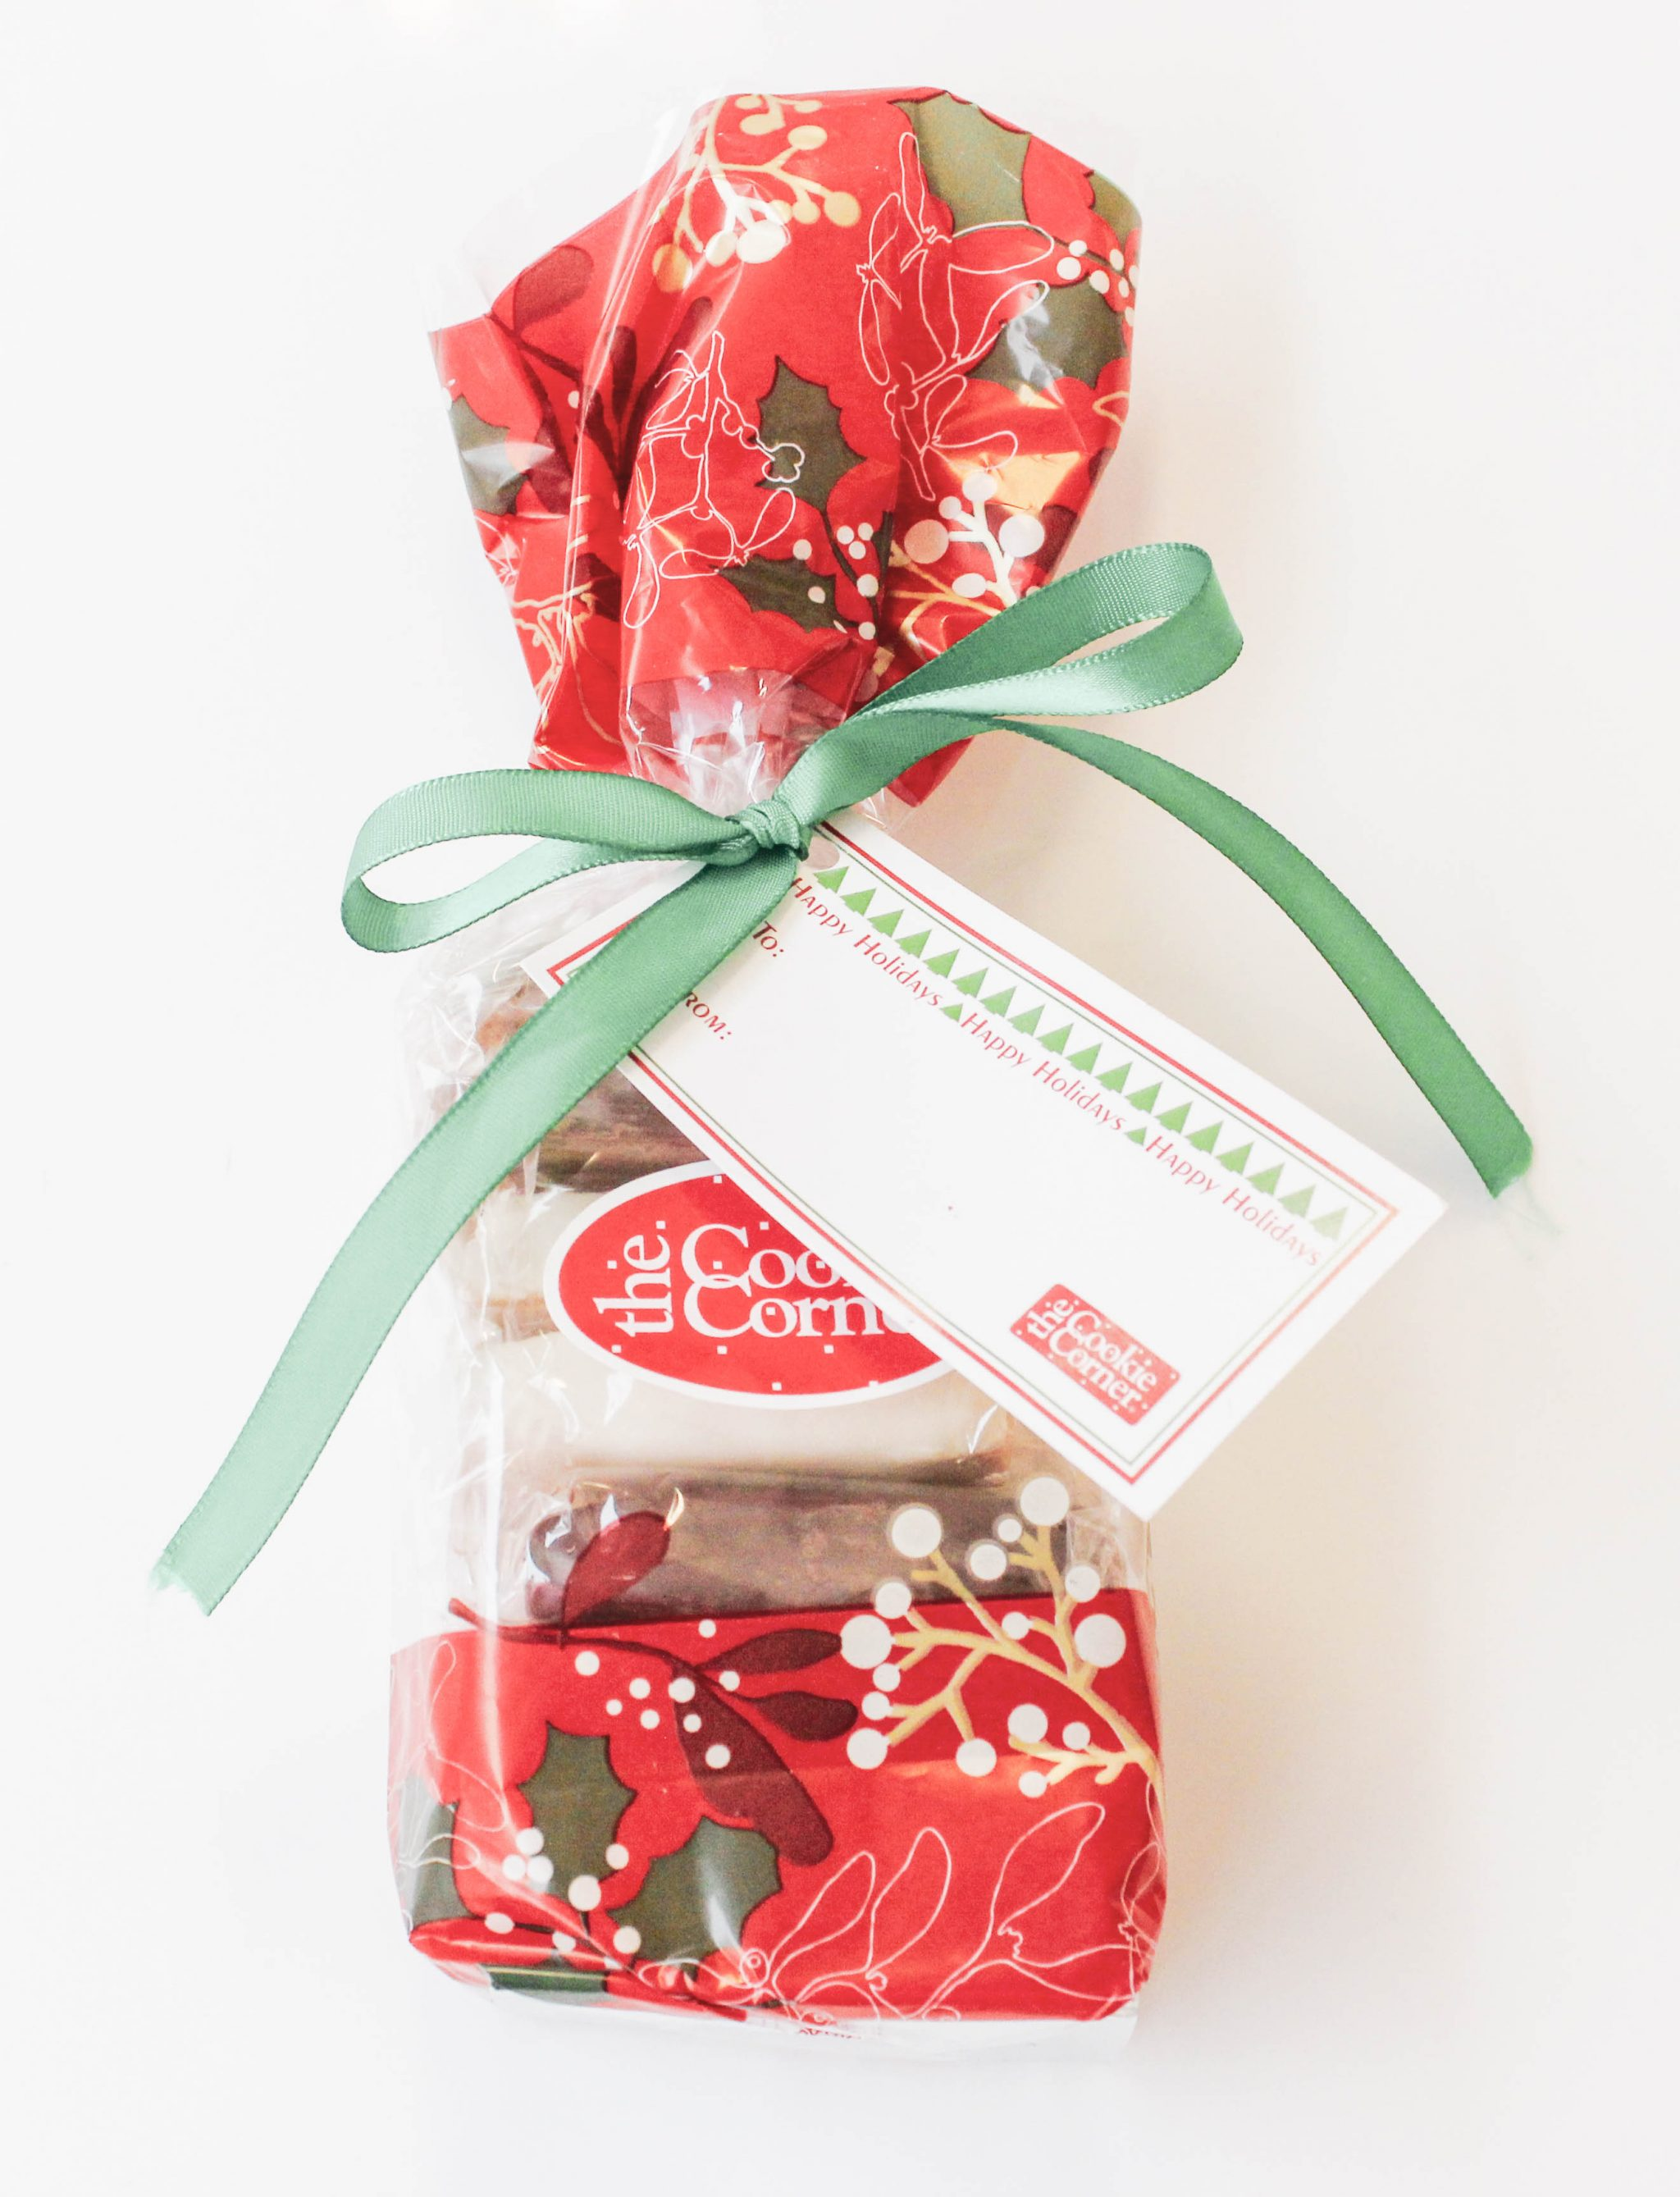 ¡Muchas gracias! 美味しいクリスマスのチョコ菓子・1